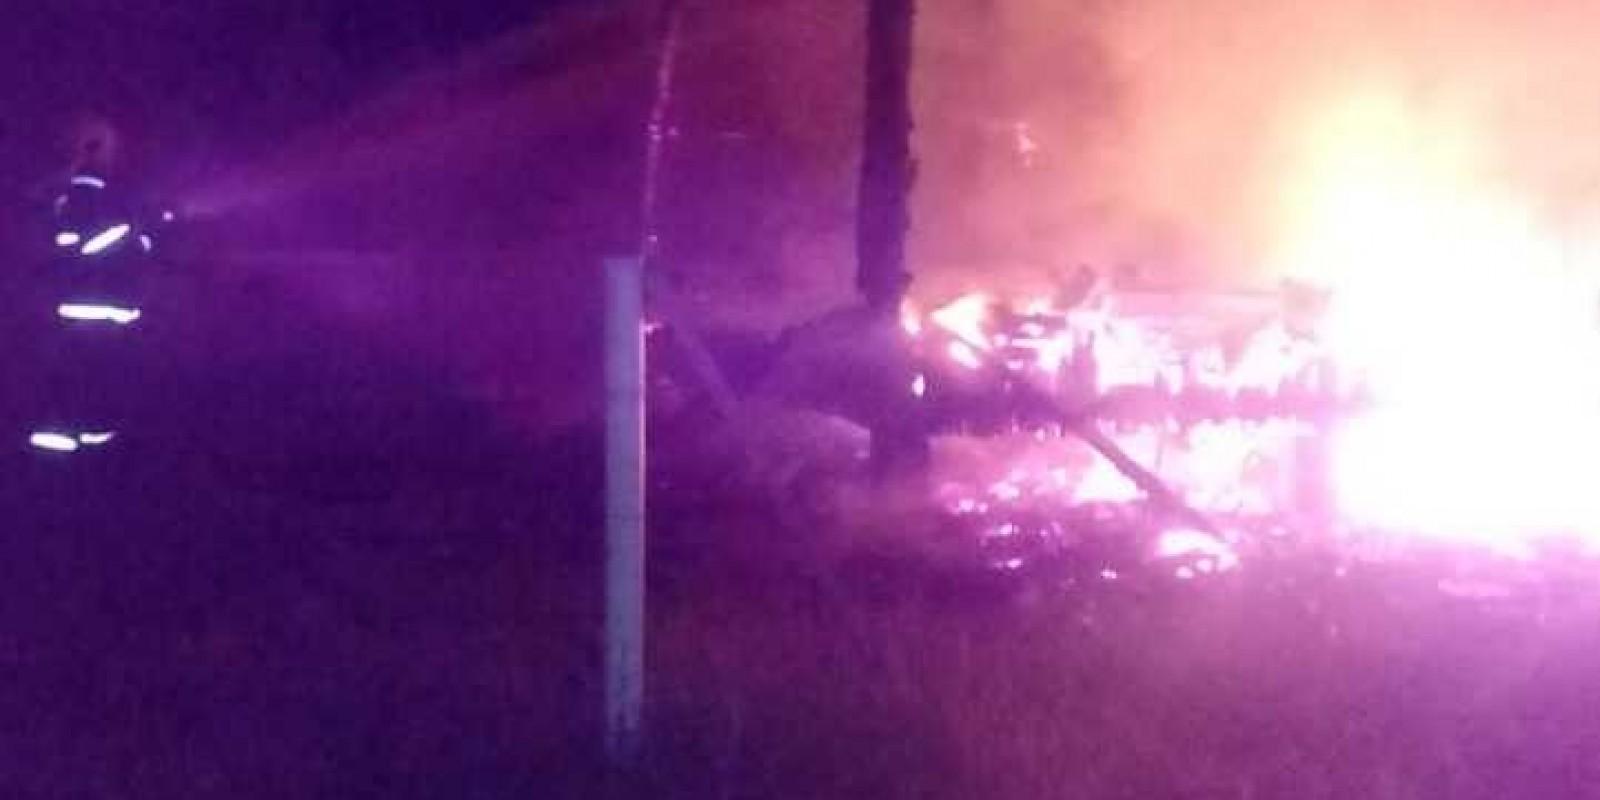 Fogo destrói casa abandonada na Galheta, em Laguna